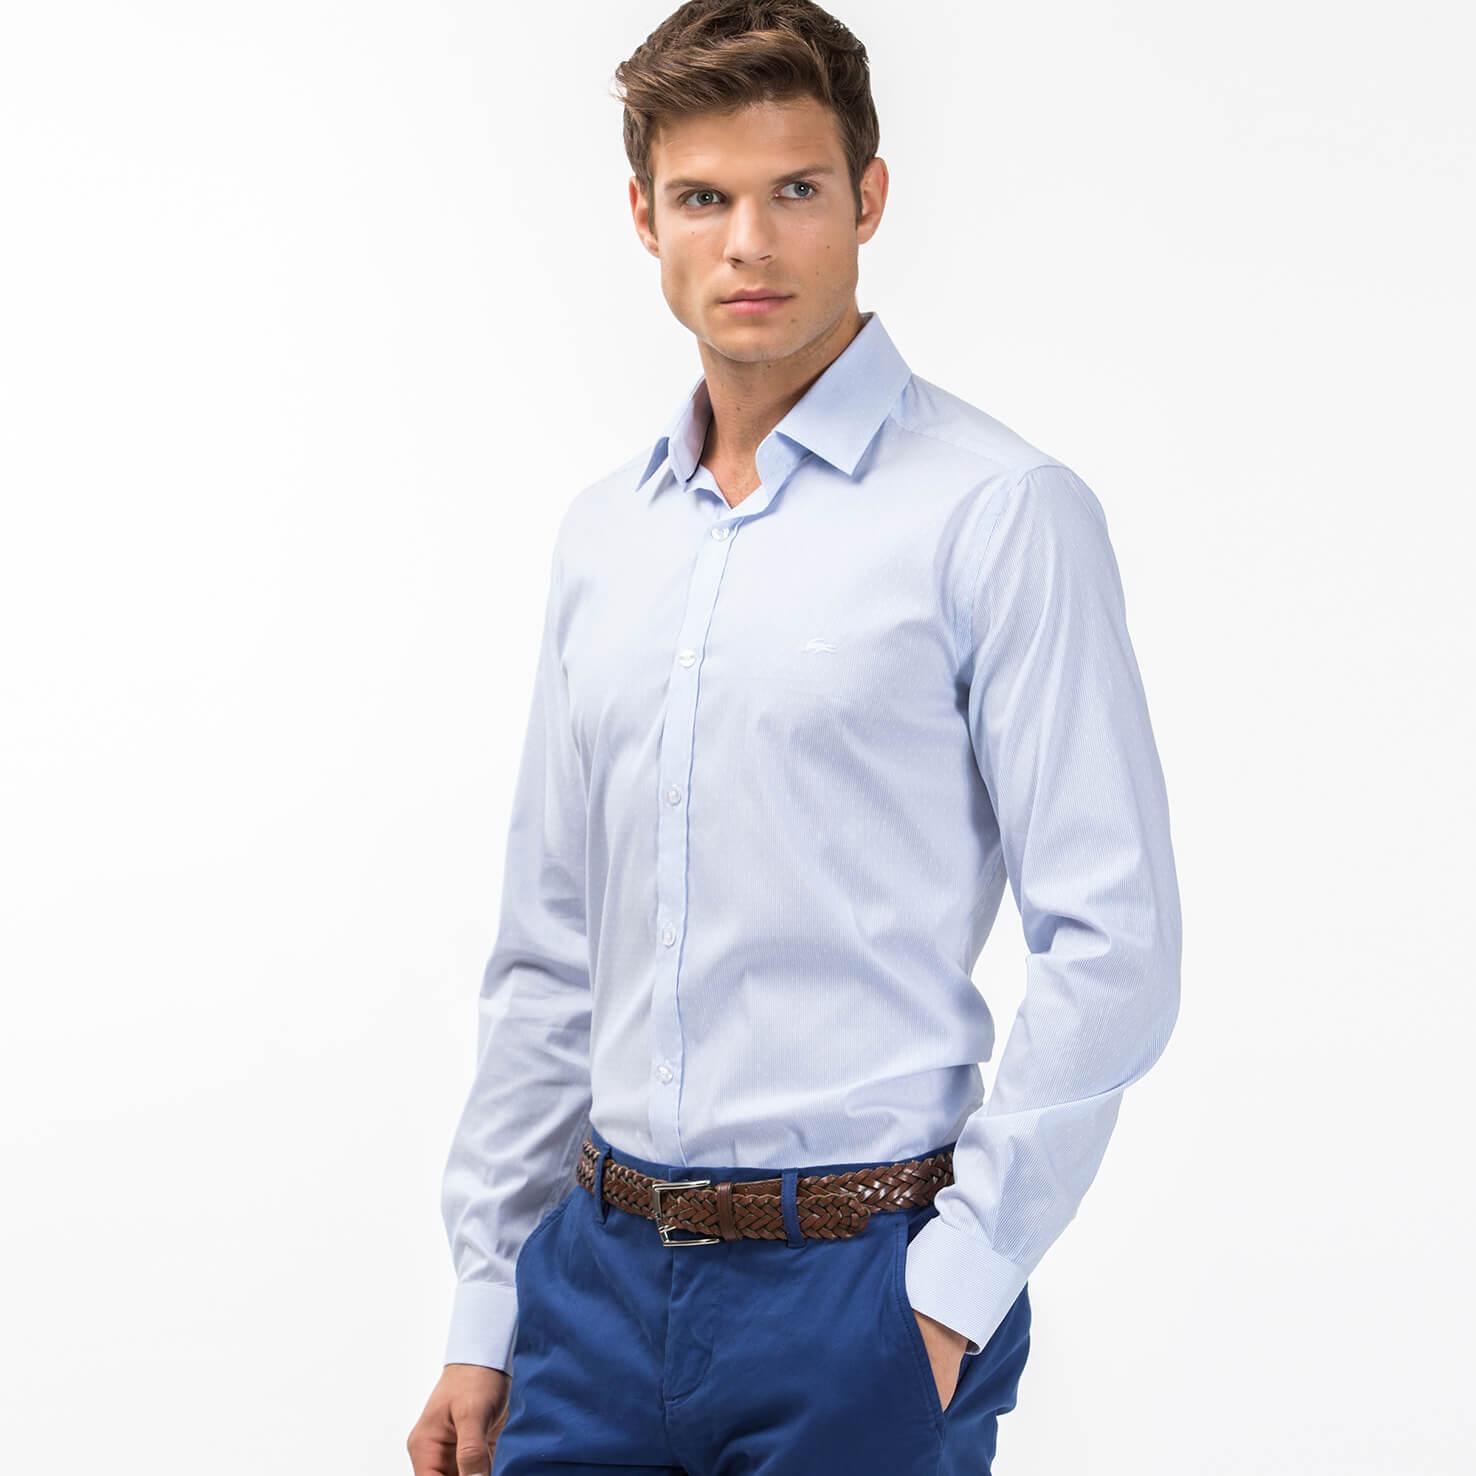 Lacoste Men's Slim Fit Polka Dots And Stripes Jacquard Poplin Shirt